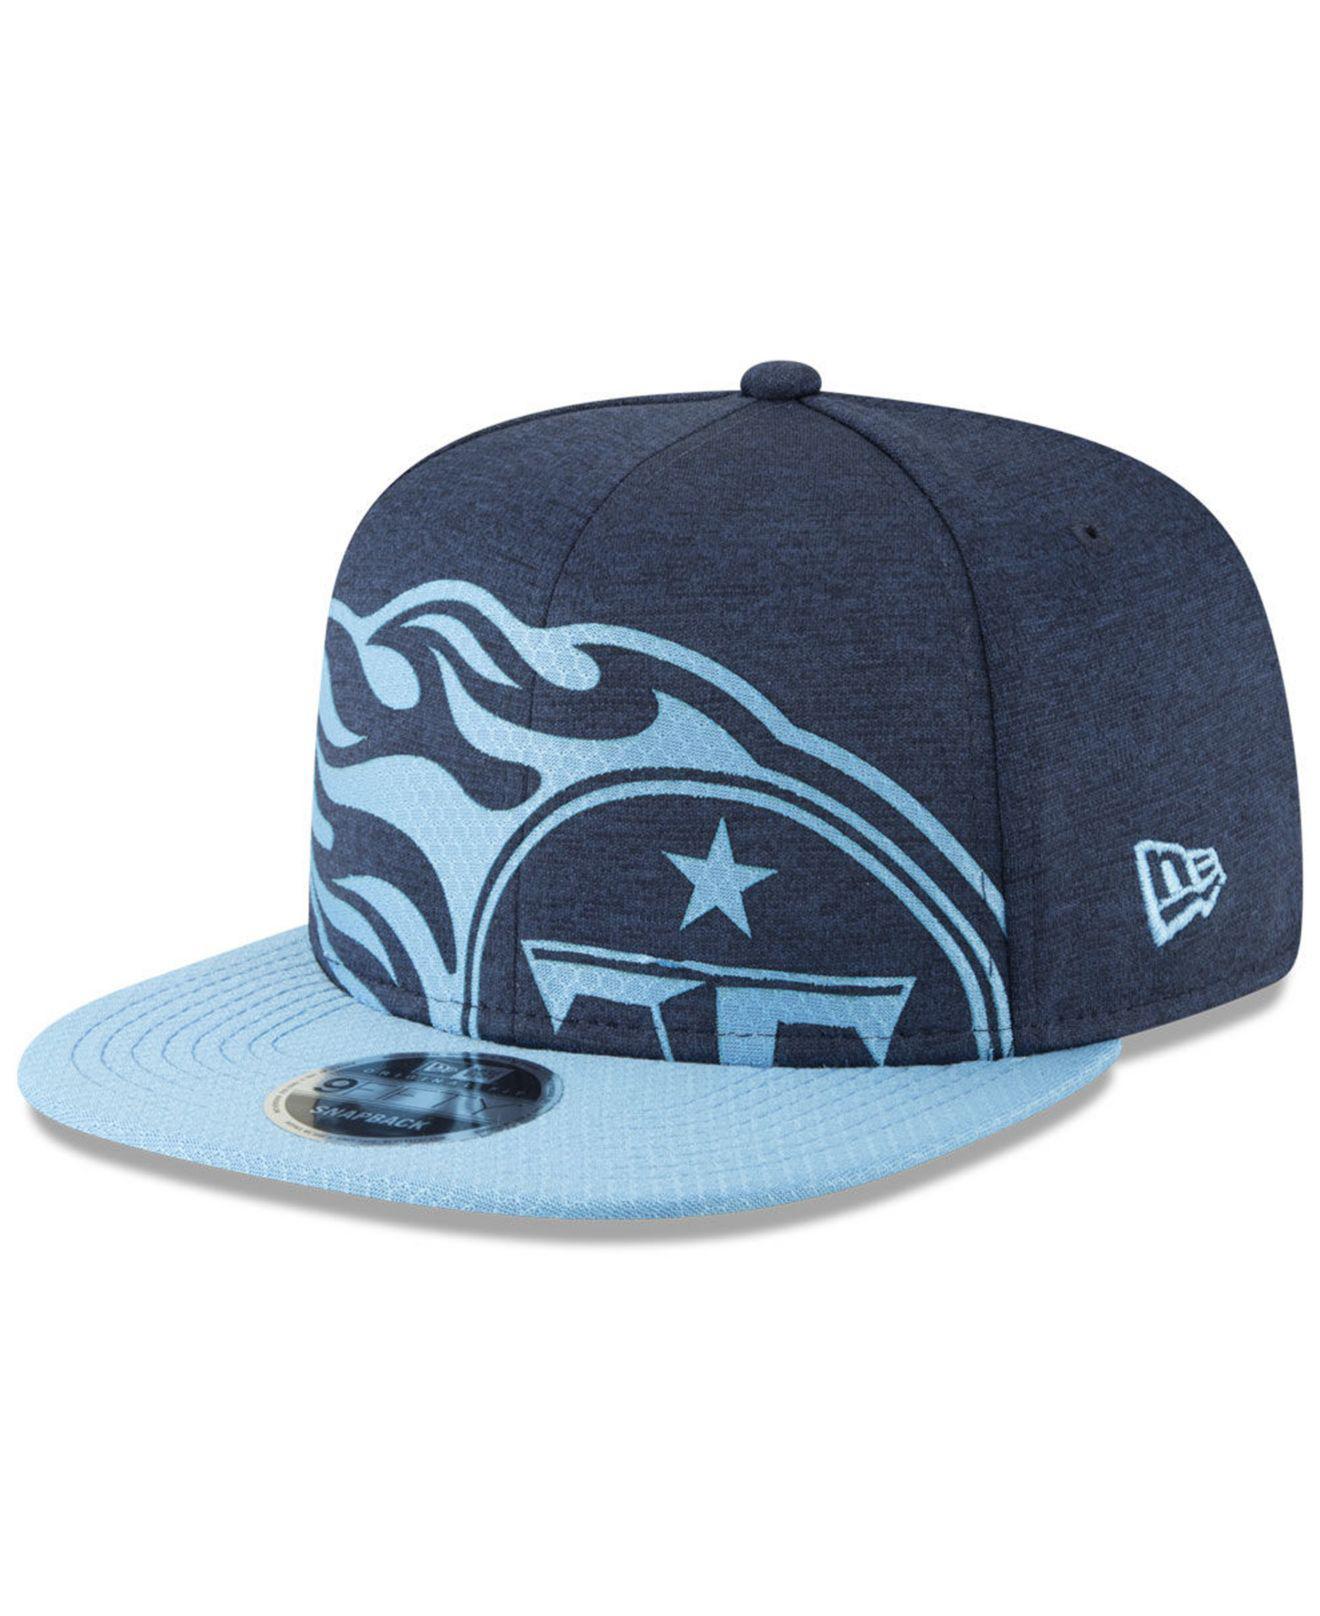 9ecd5247eb2 KTZ. Men s Blue Tennessee Titans Oversized Laser Cut 9fifty Snapback Cap